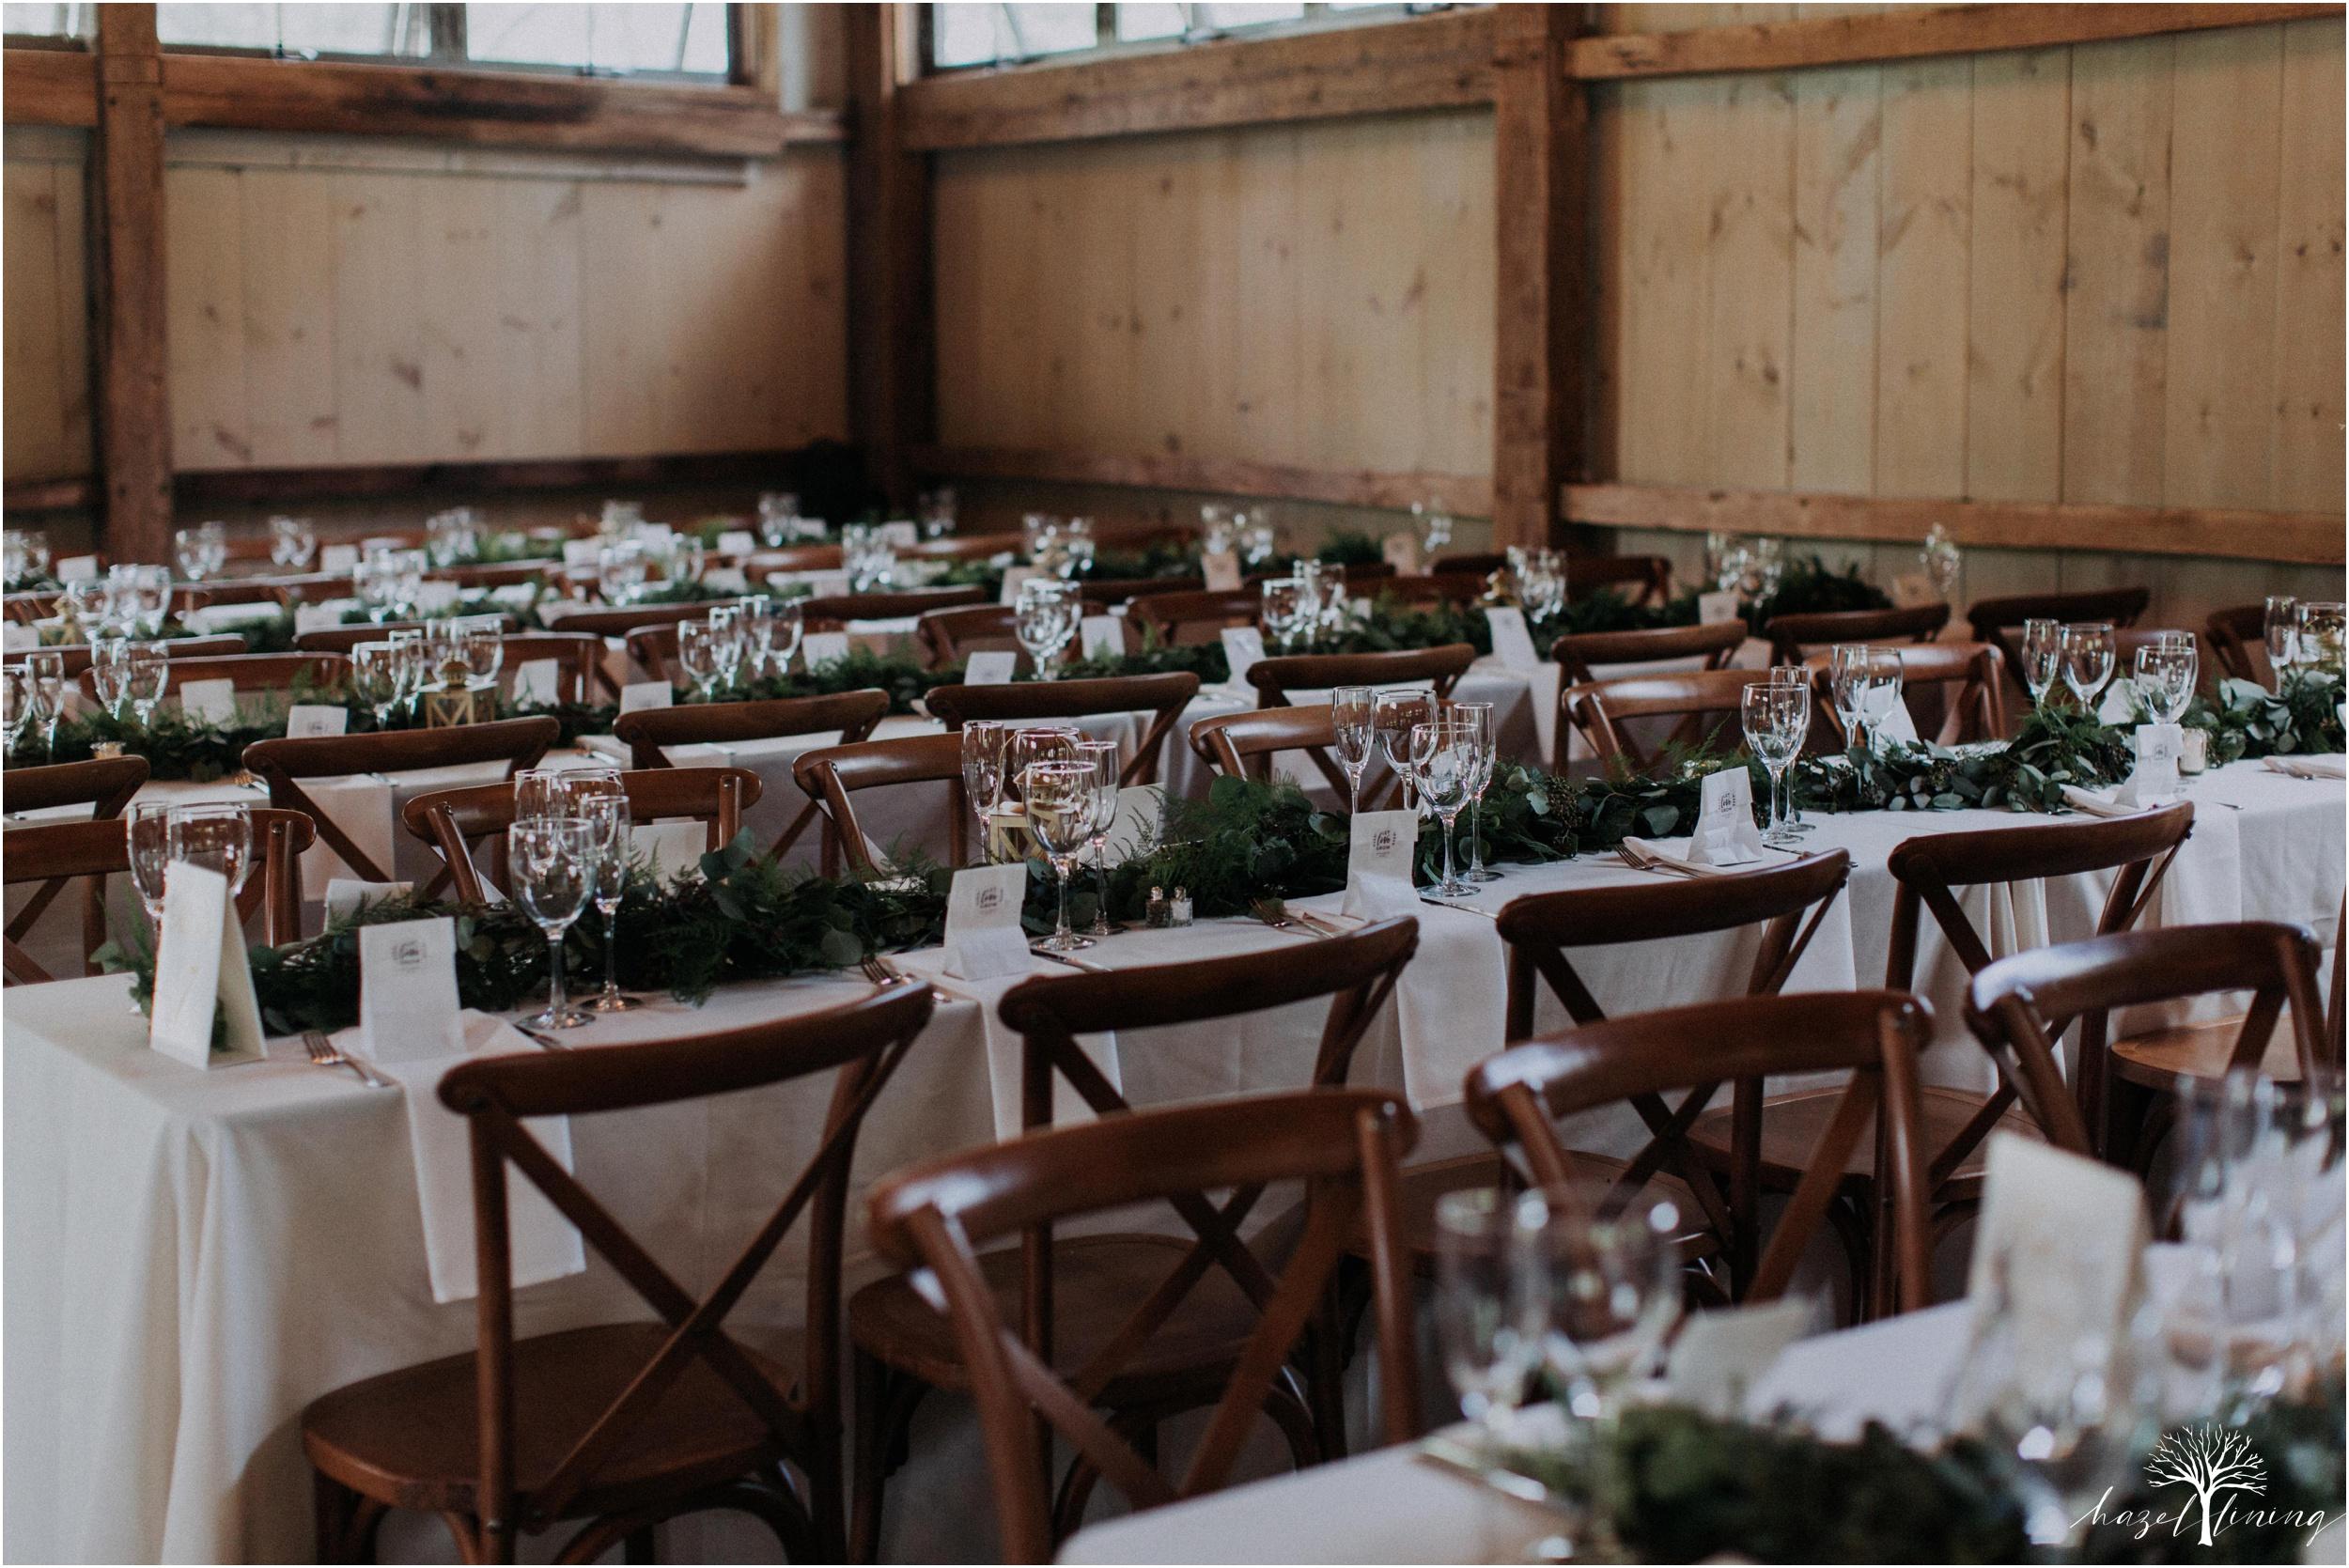 hazel-lining-travel-wedding-elopement-photography-lisa-landon-shoemaker-the-farm-bakery-and-events-bucks-county-quakertown-pennsylvania-summer-country-outdoor-farm-wedding_0107.jpg